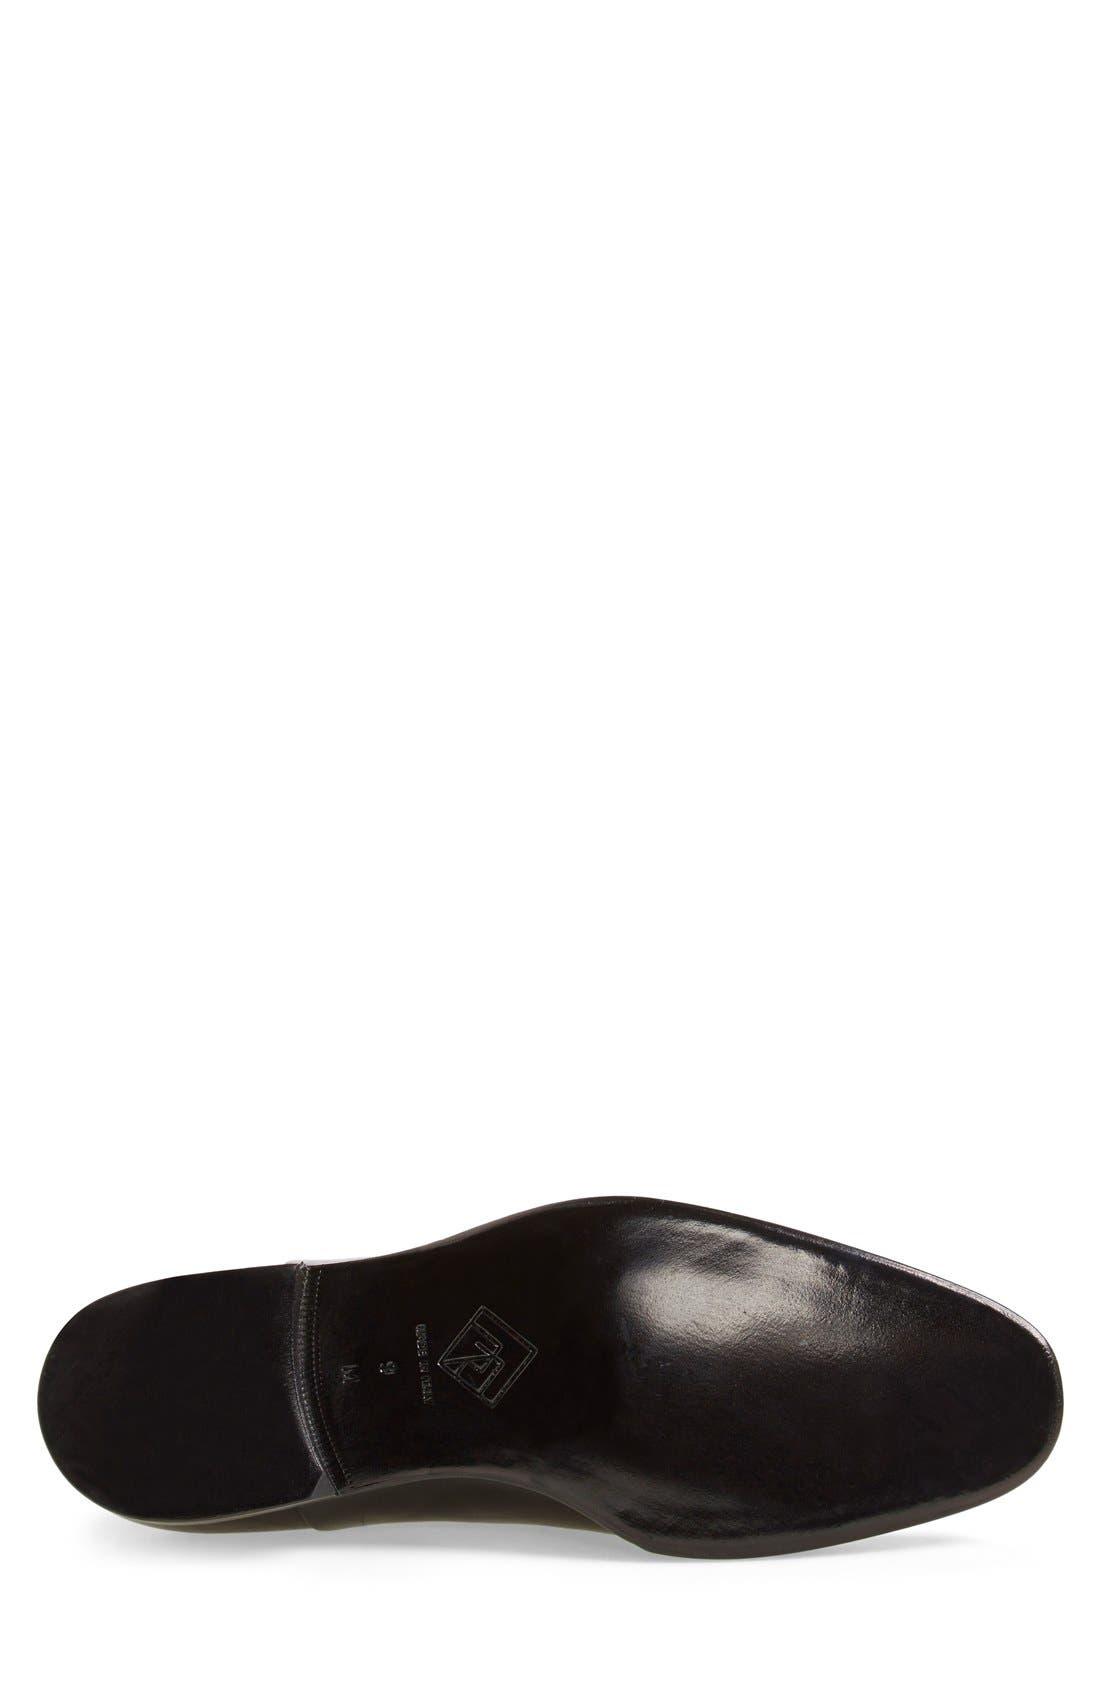 Lazio Cap-Toe Oxford,                             Alternate thumbnail 4, color,                             Black